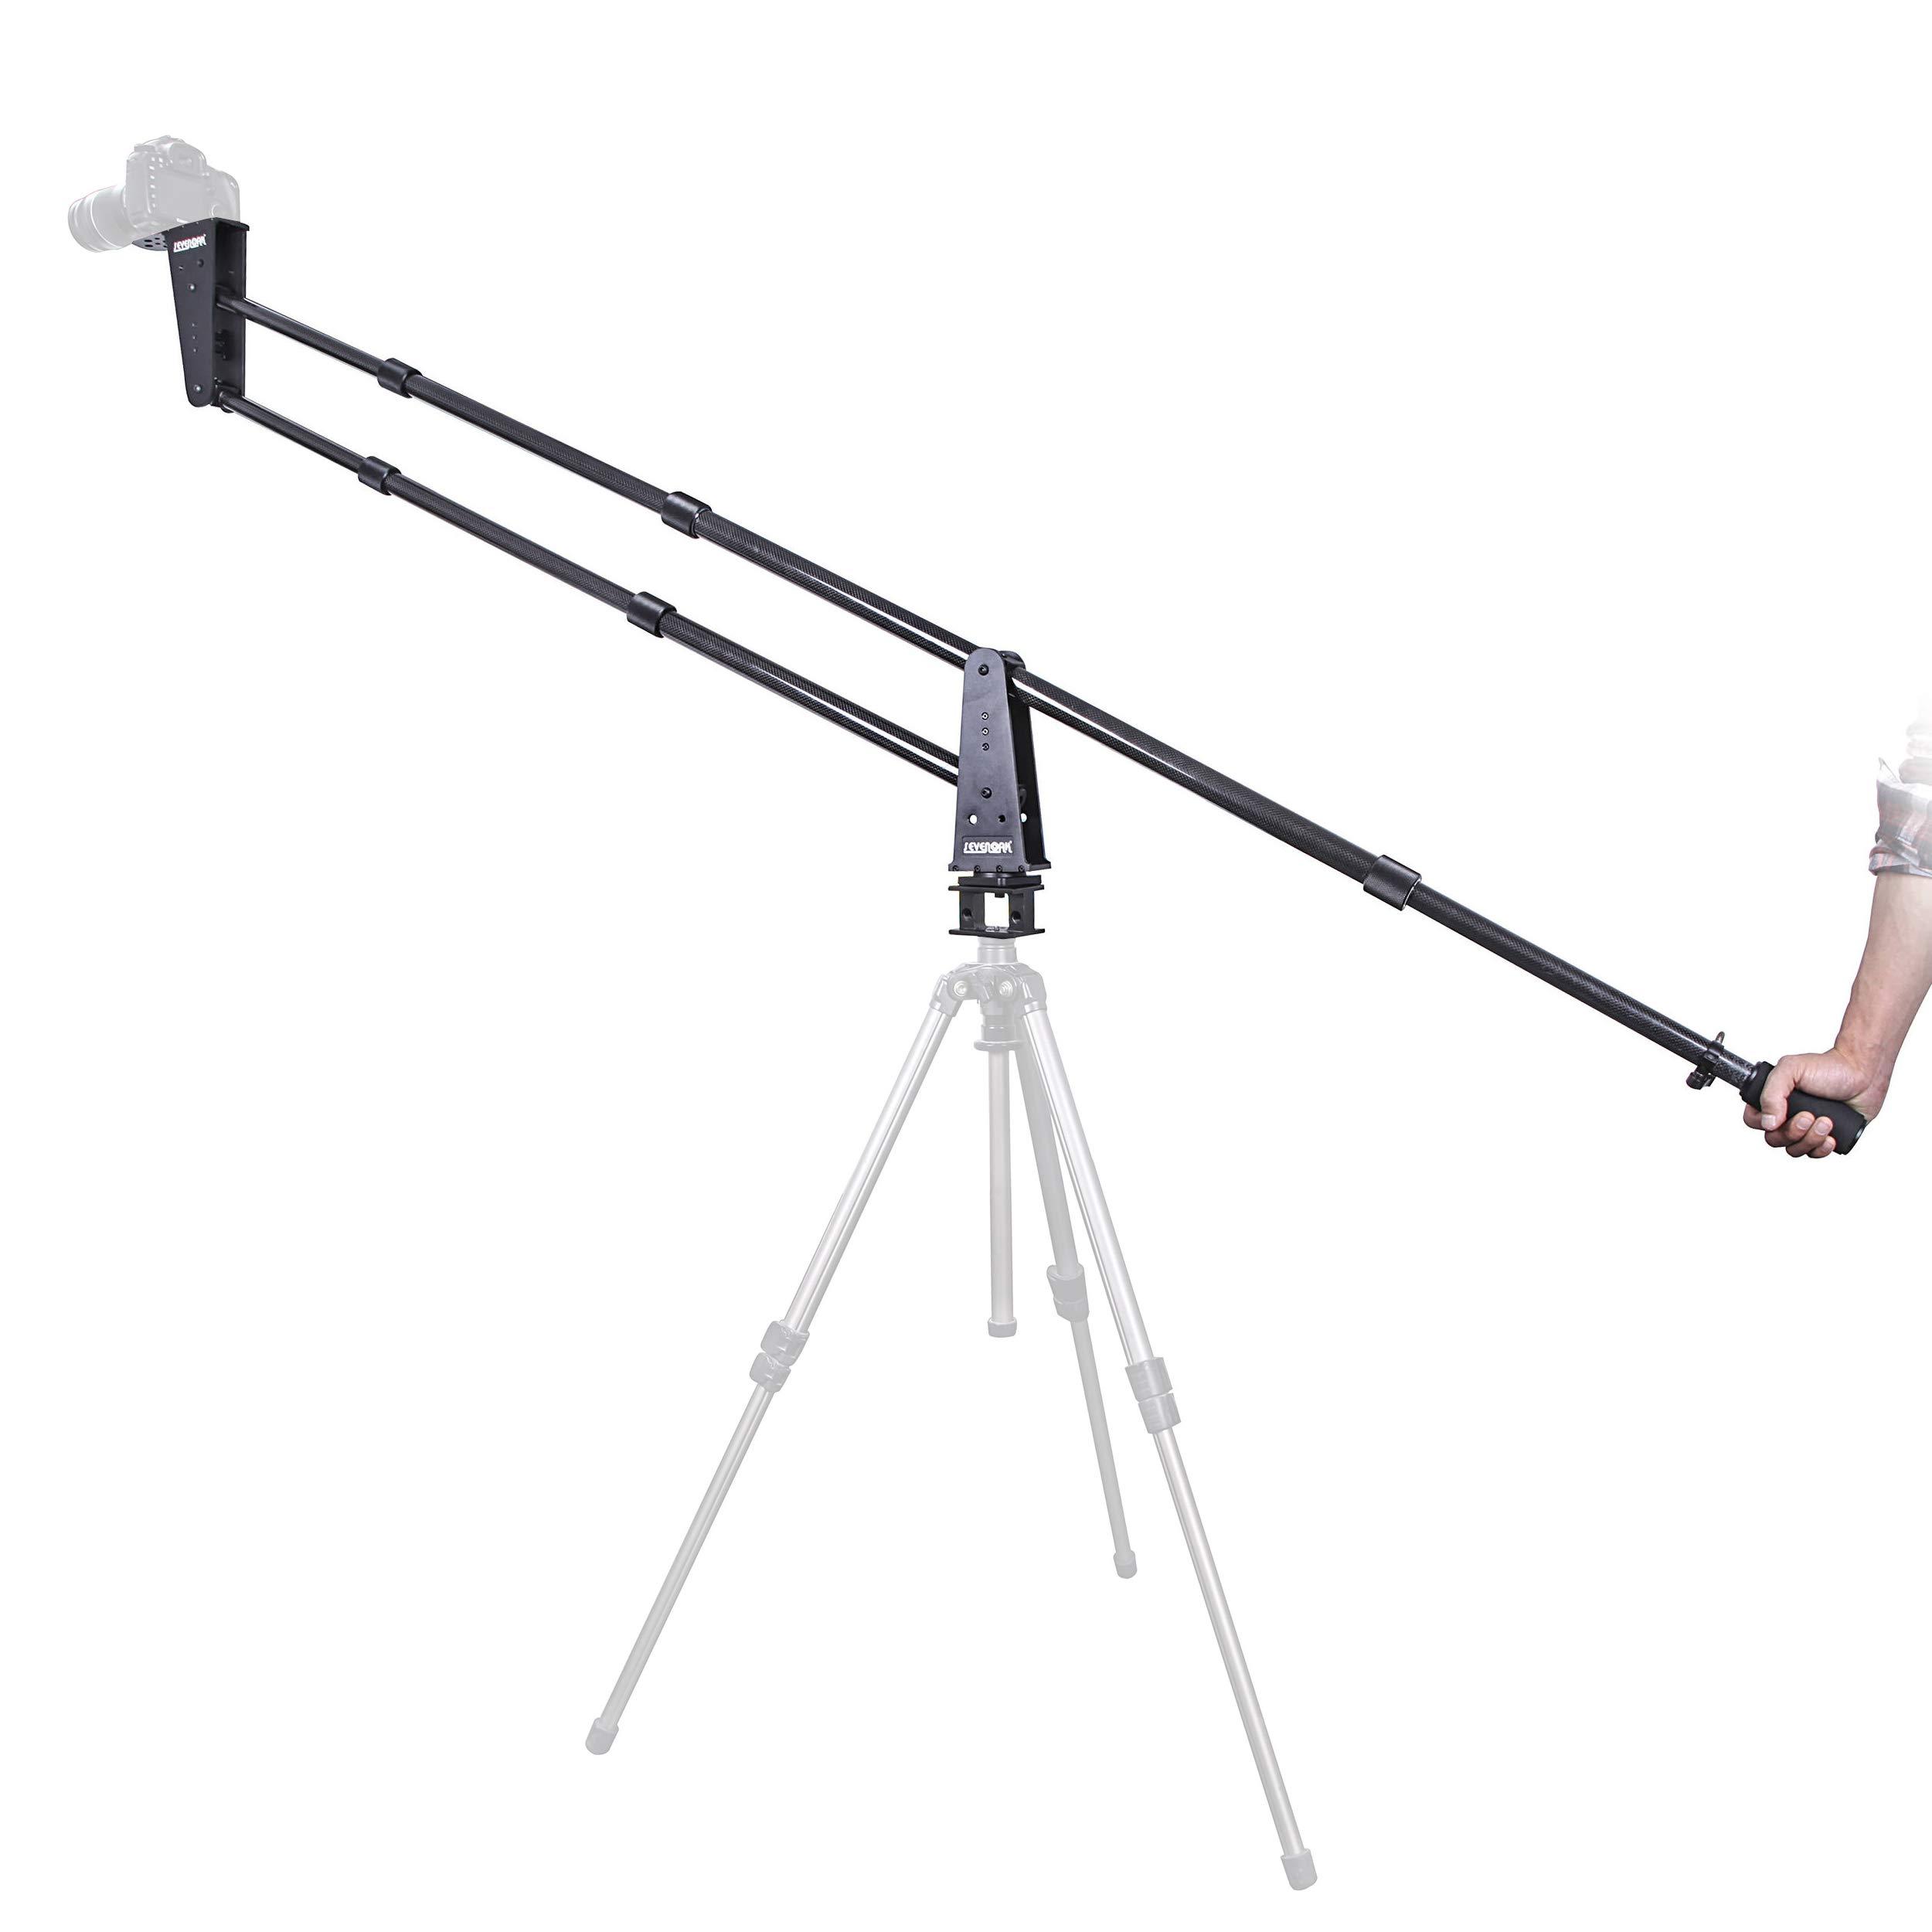 Sevenoak SK-JA20-II 7-Foot Carbon Fiber Jib/Crane with 360° Panning Base - Load Capacity 11 lb (5kg) by Sevenoak